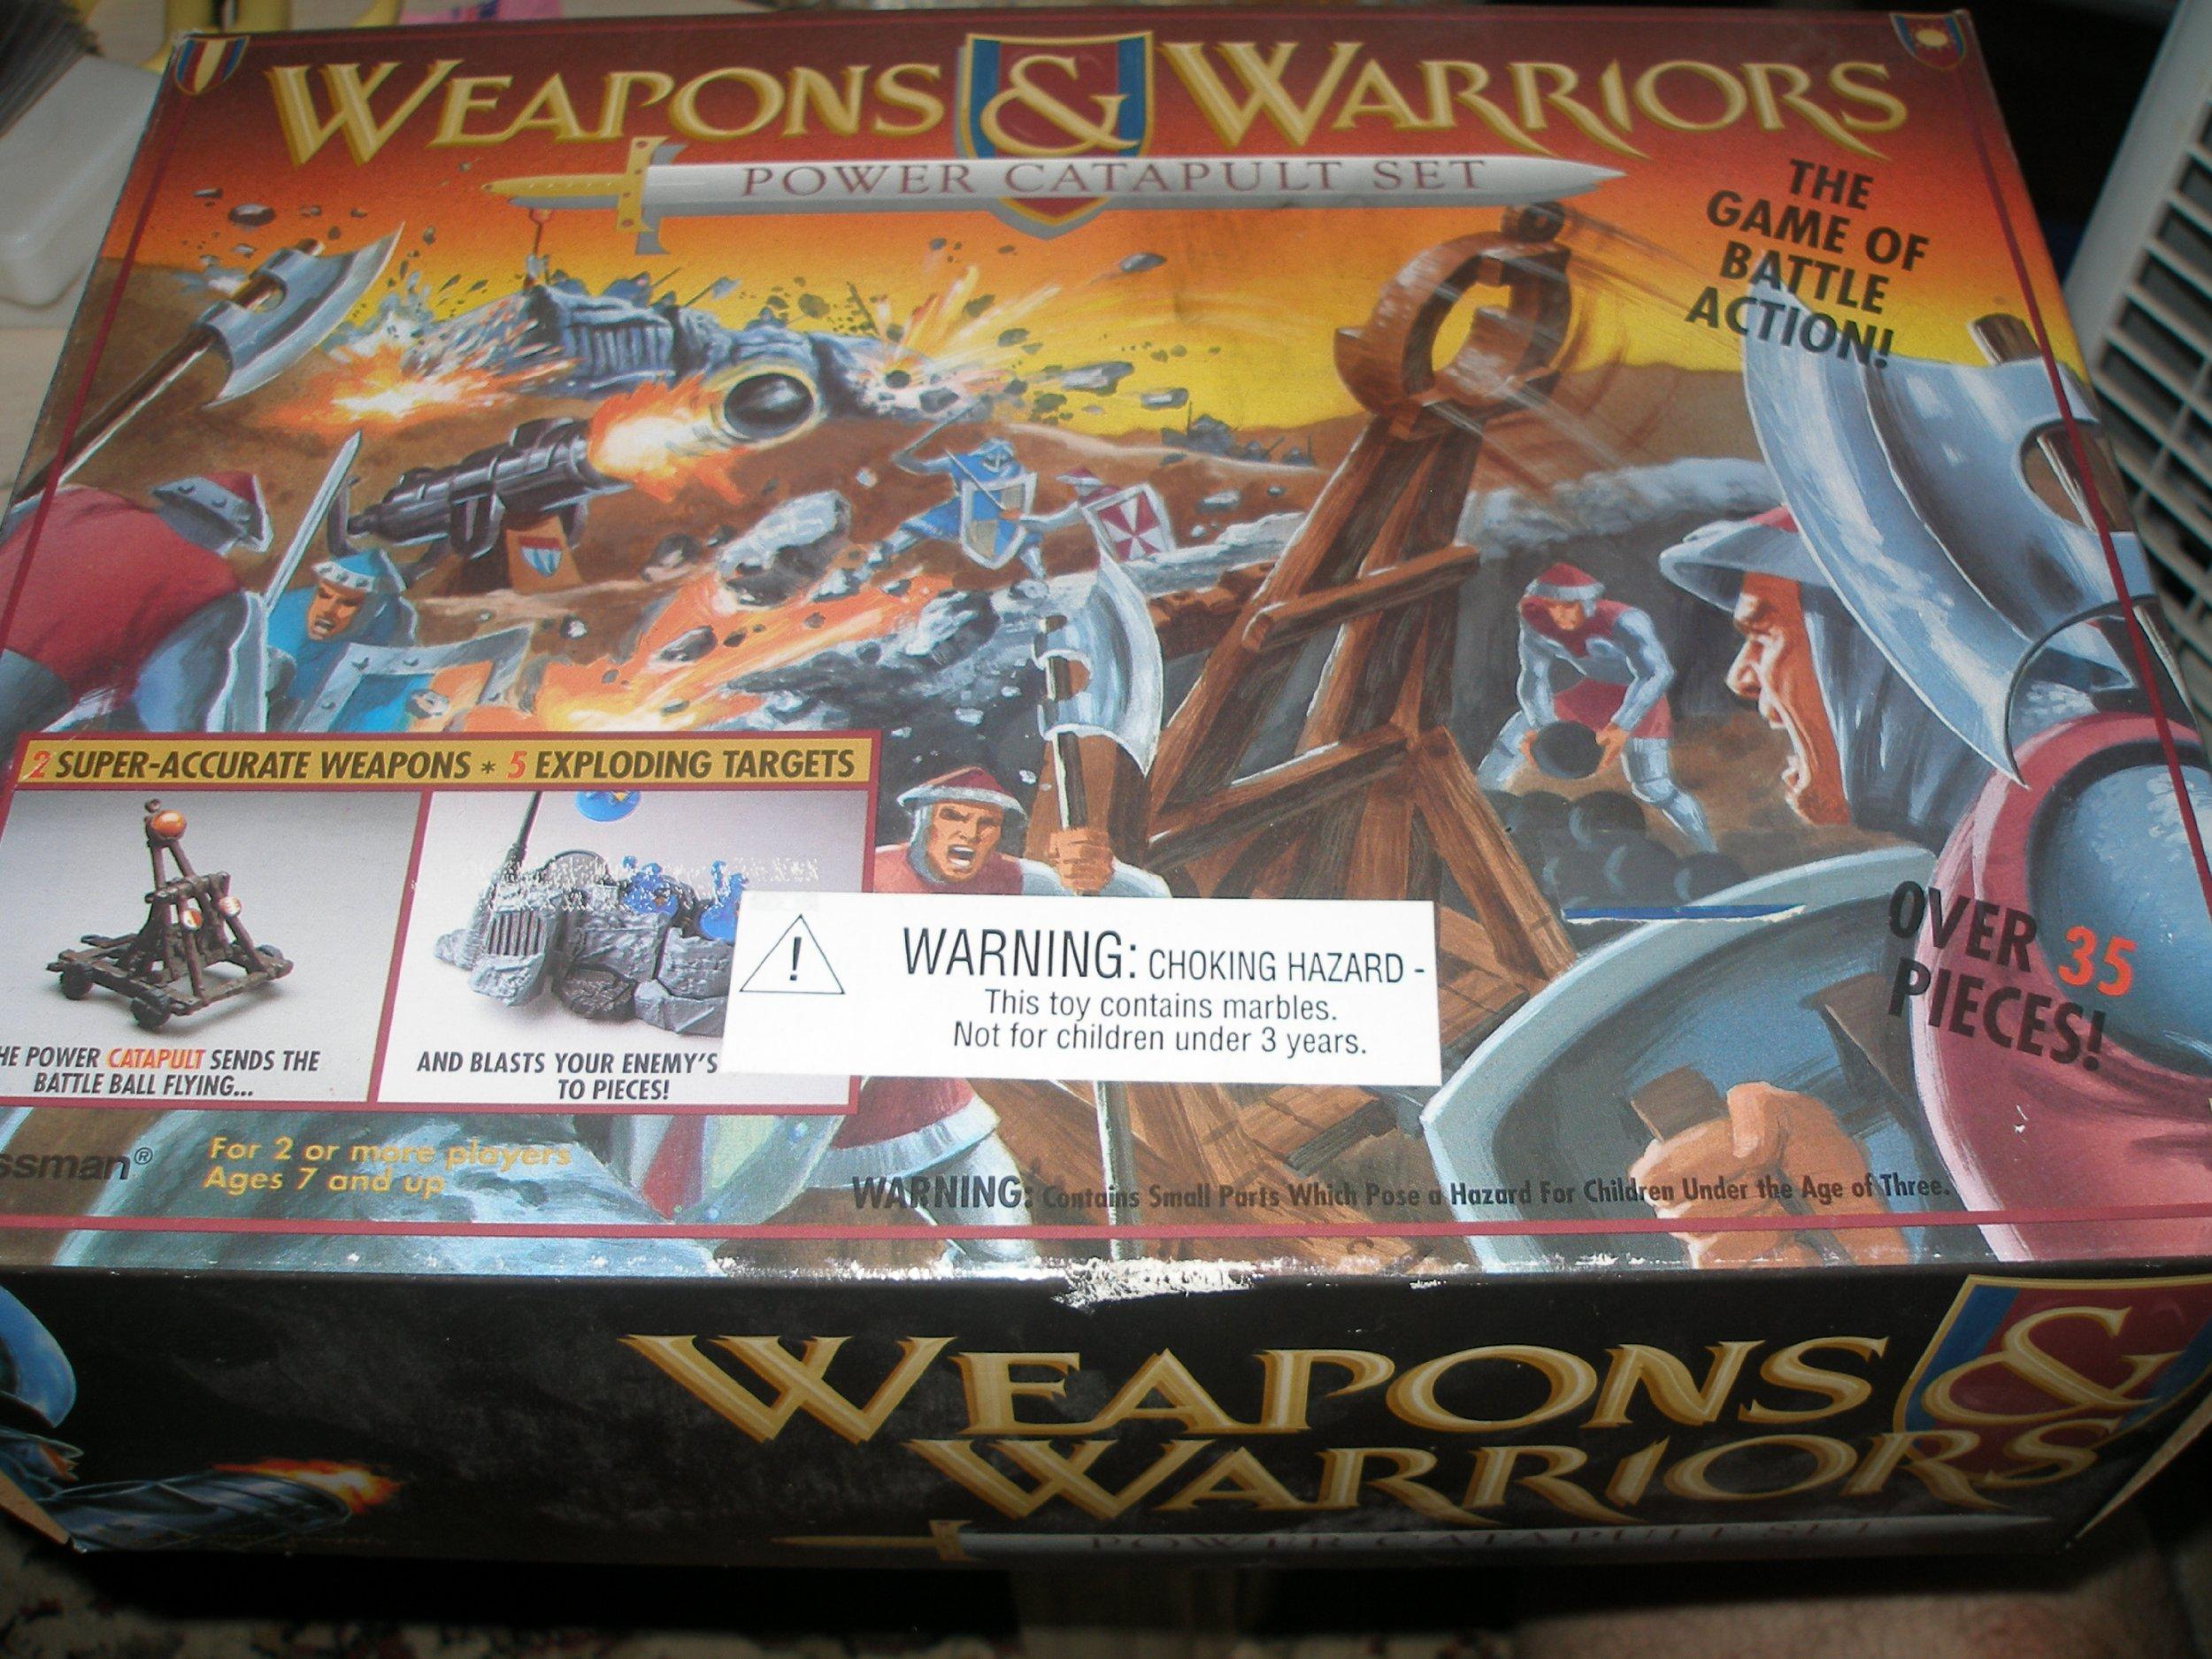 Weapons & Warriors Power Catapult Set